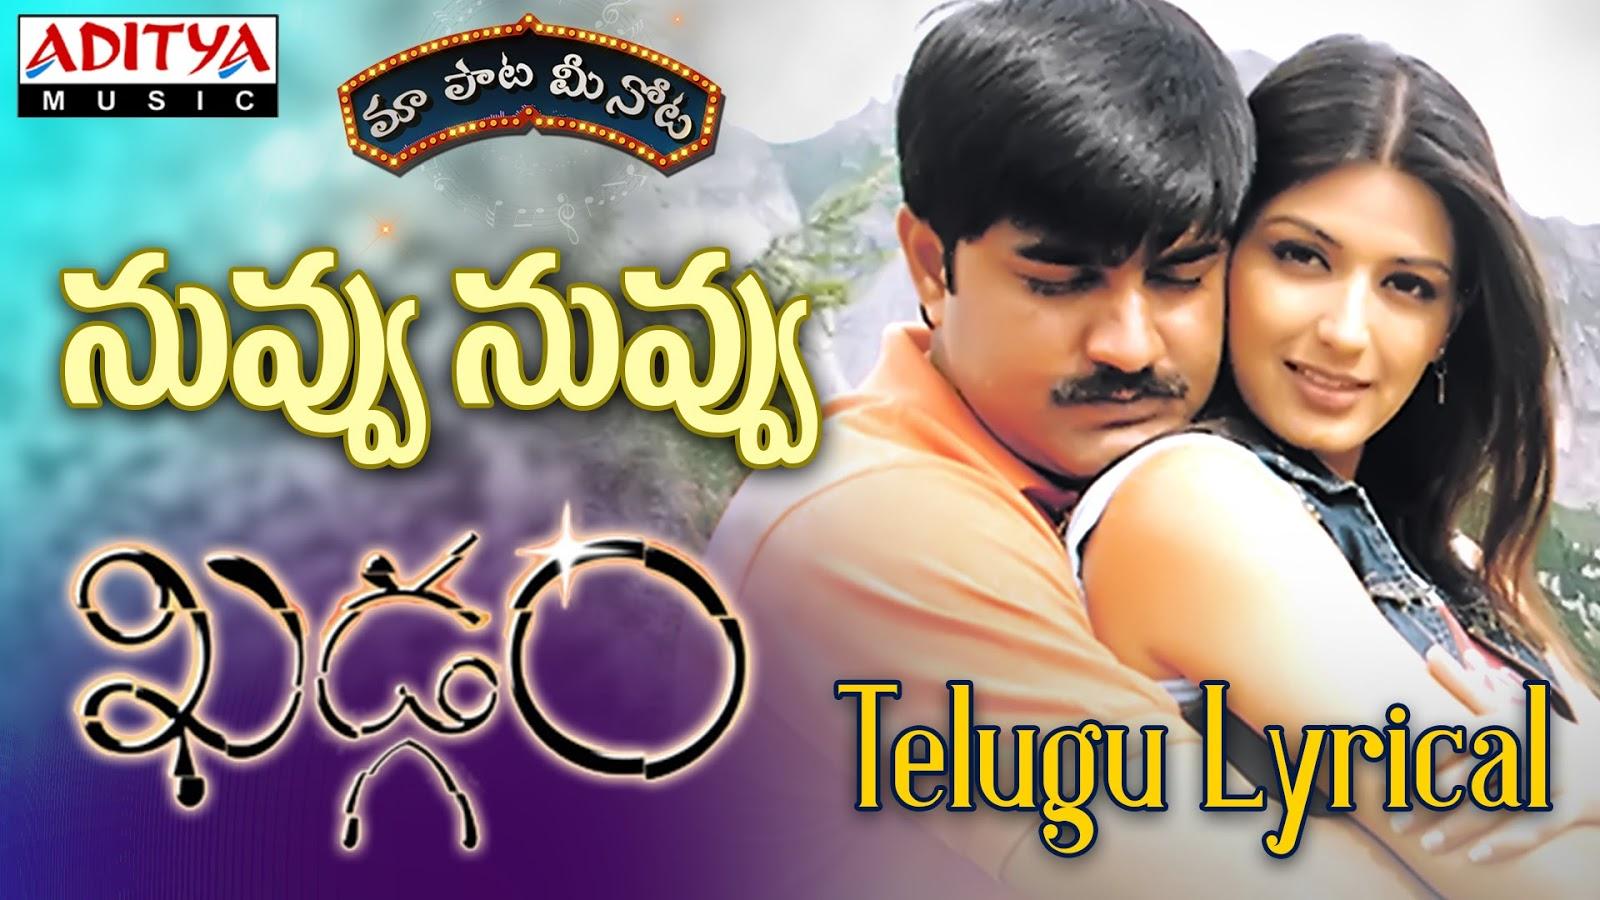 Telugu Hindi Lyrics – Migliori Pagine da Colorare